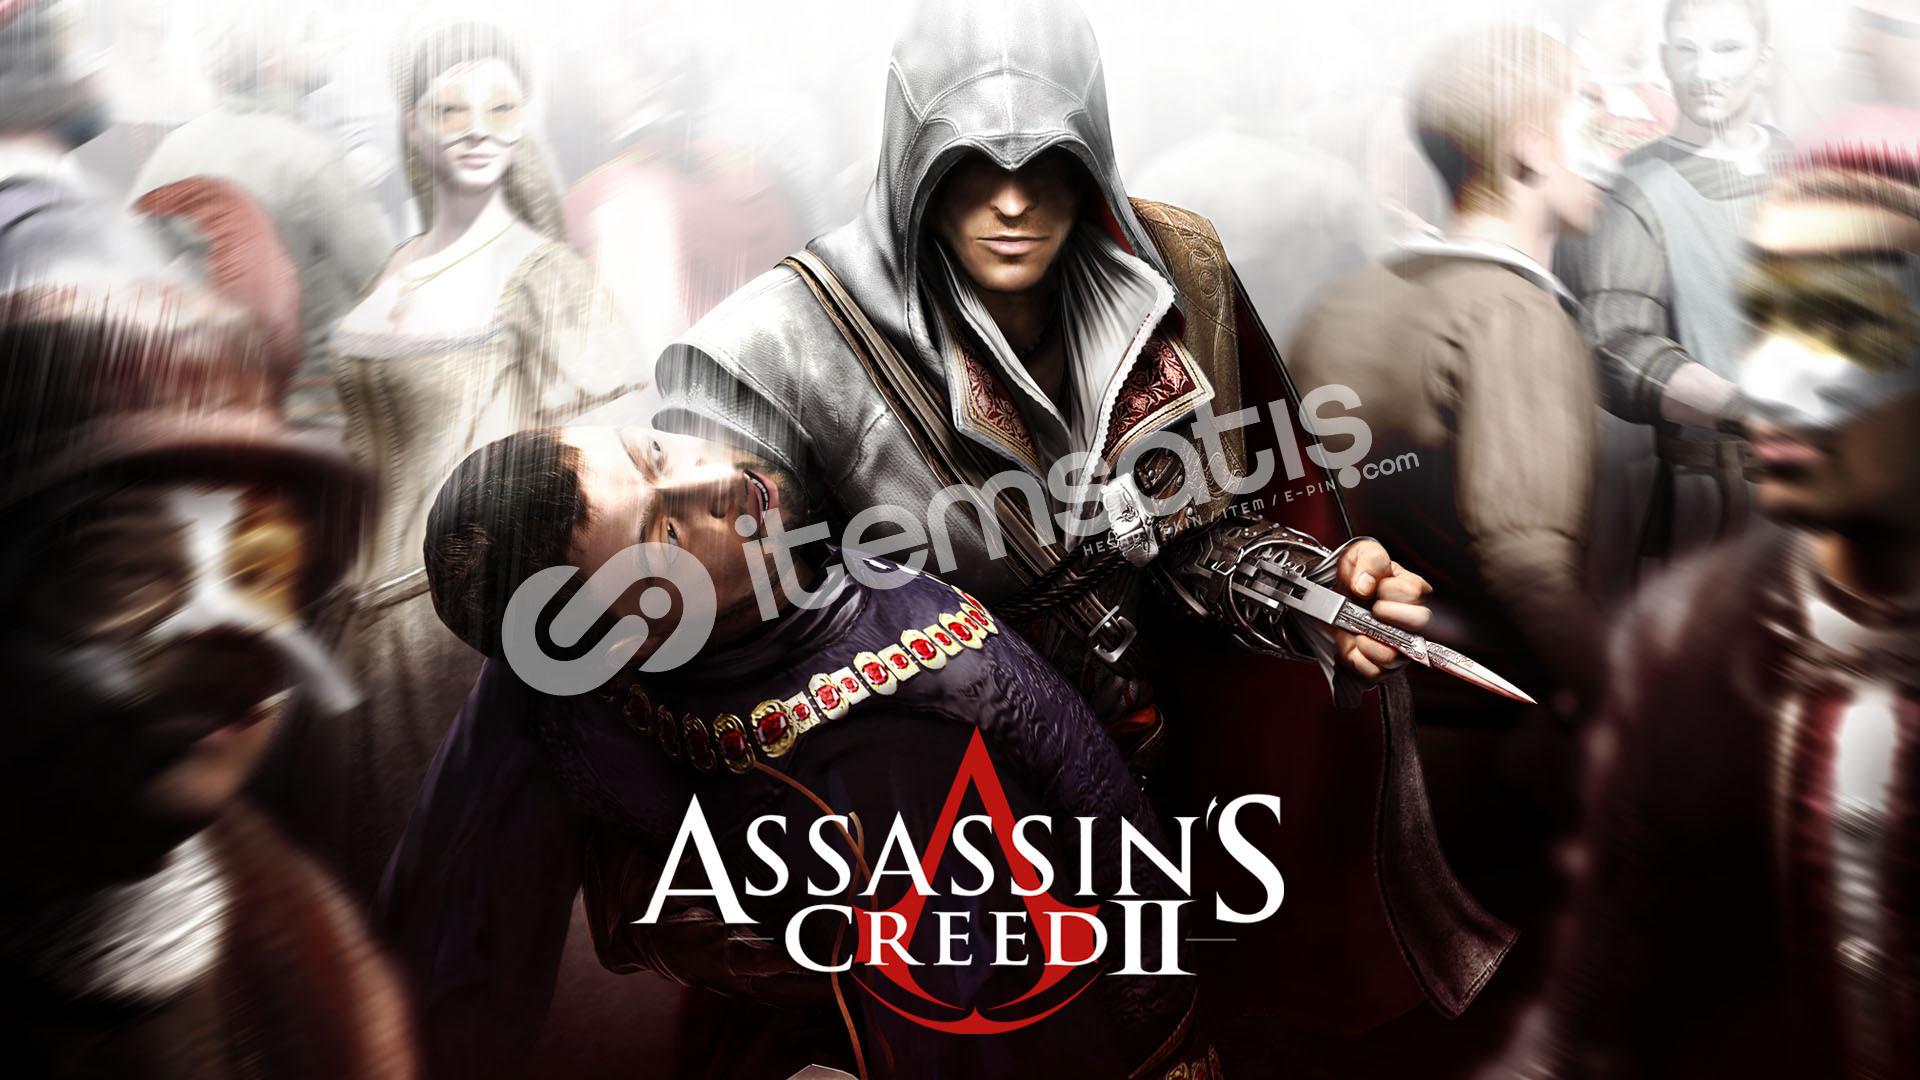 Assassin's Creed 2 +10 TL Hediye